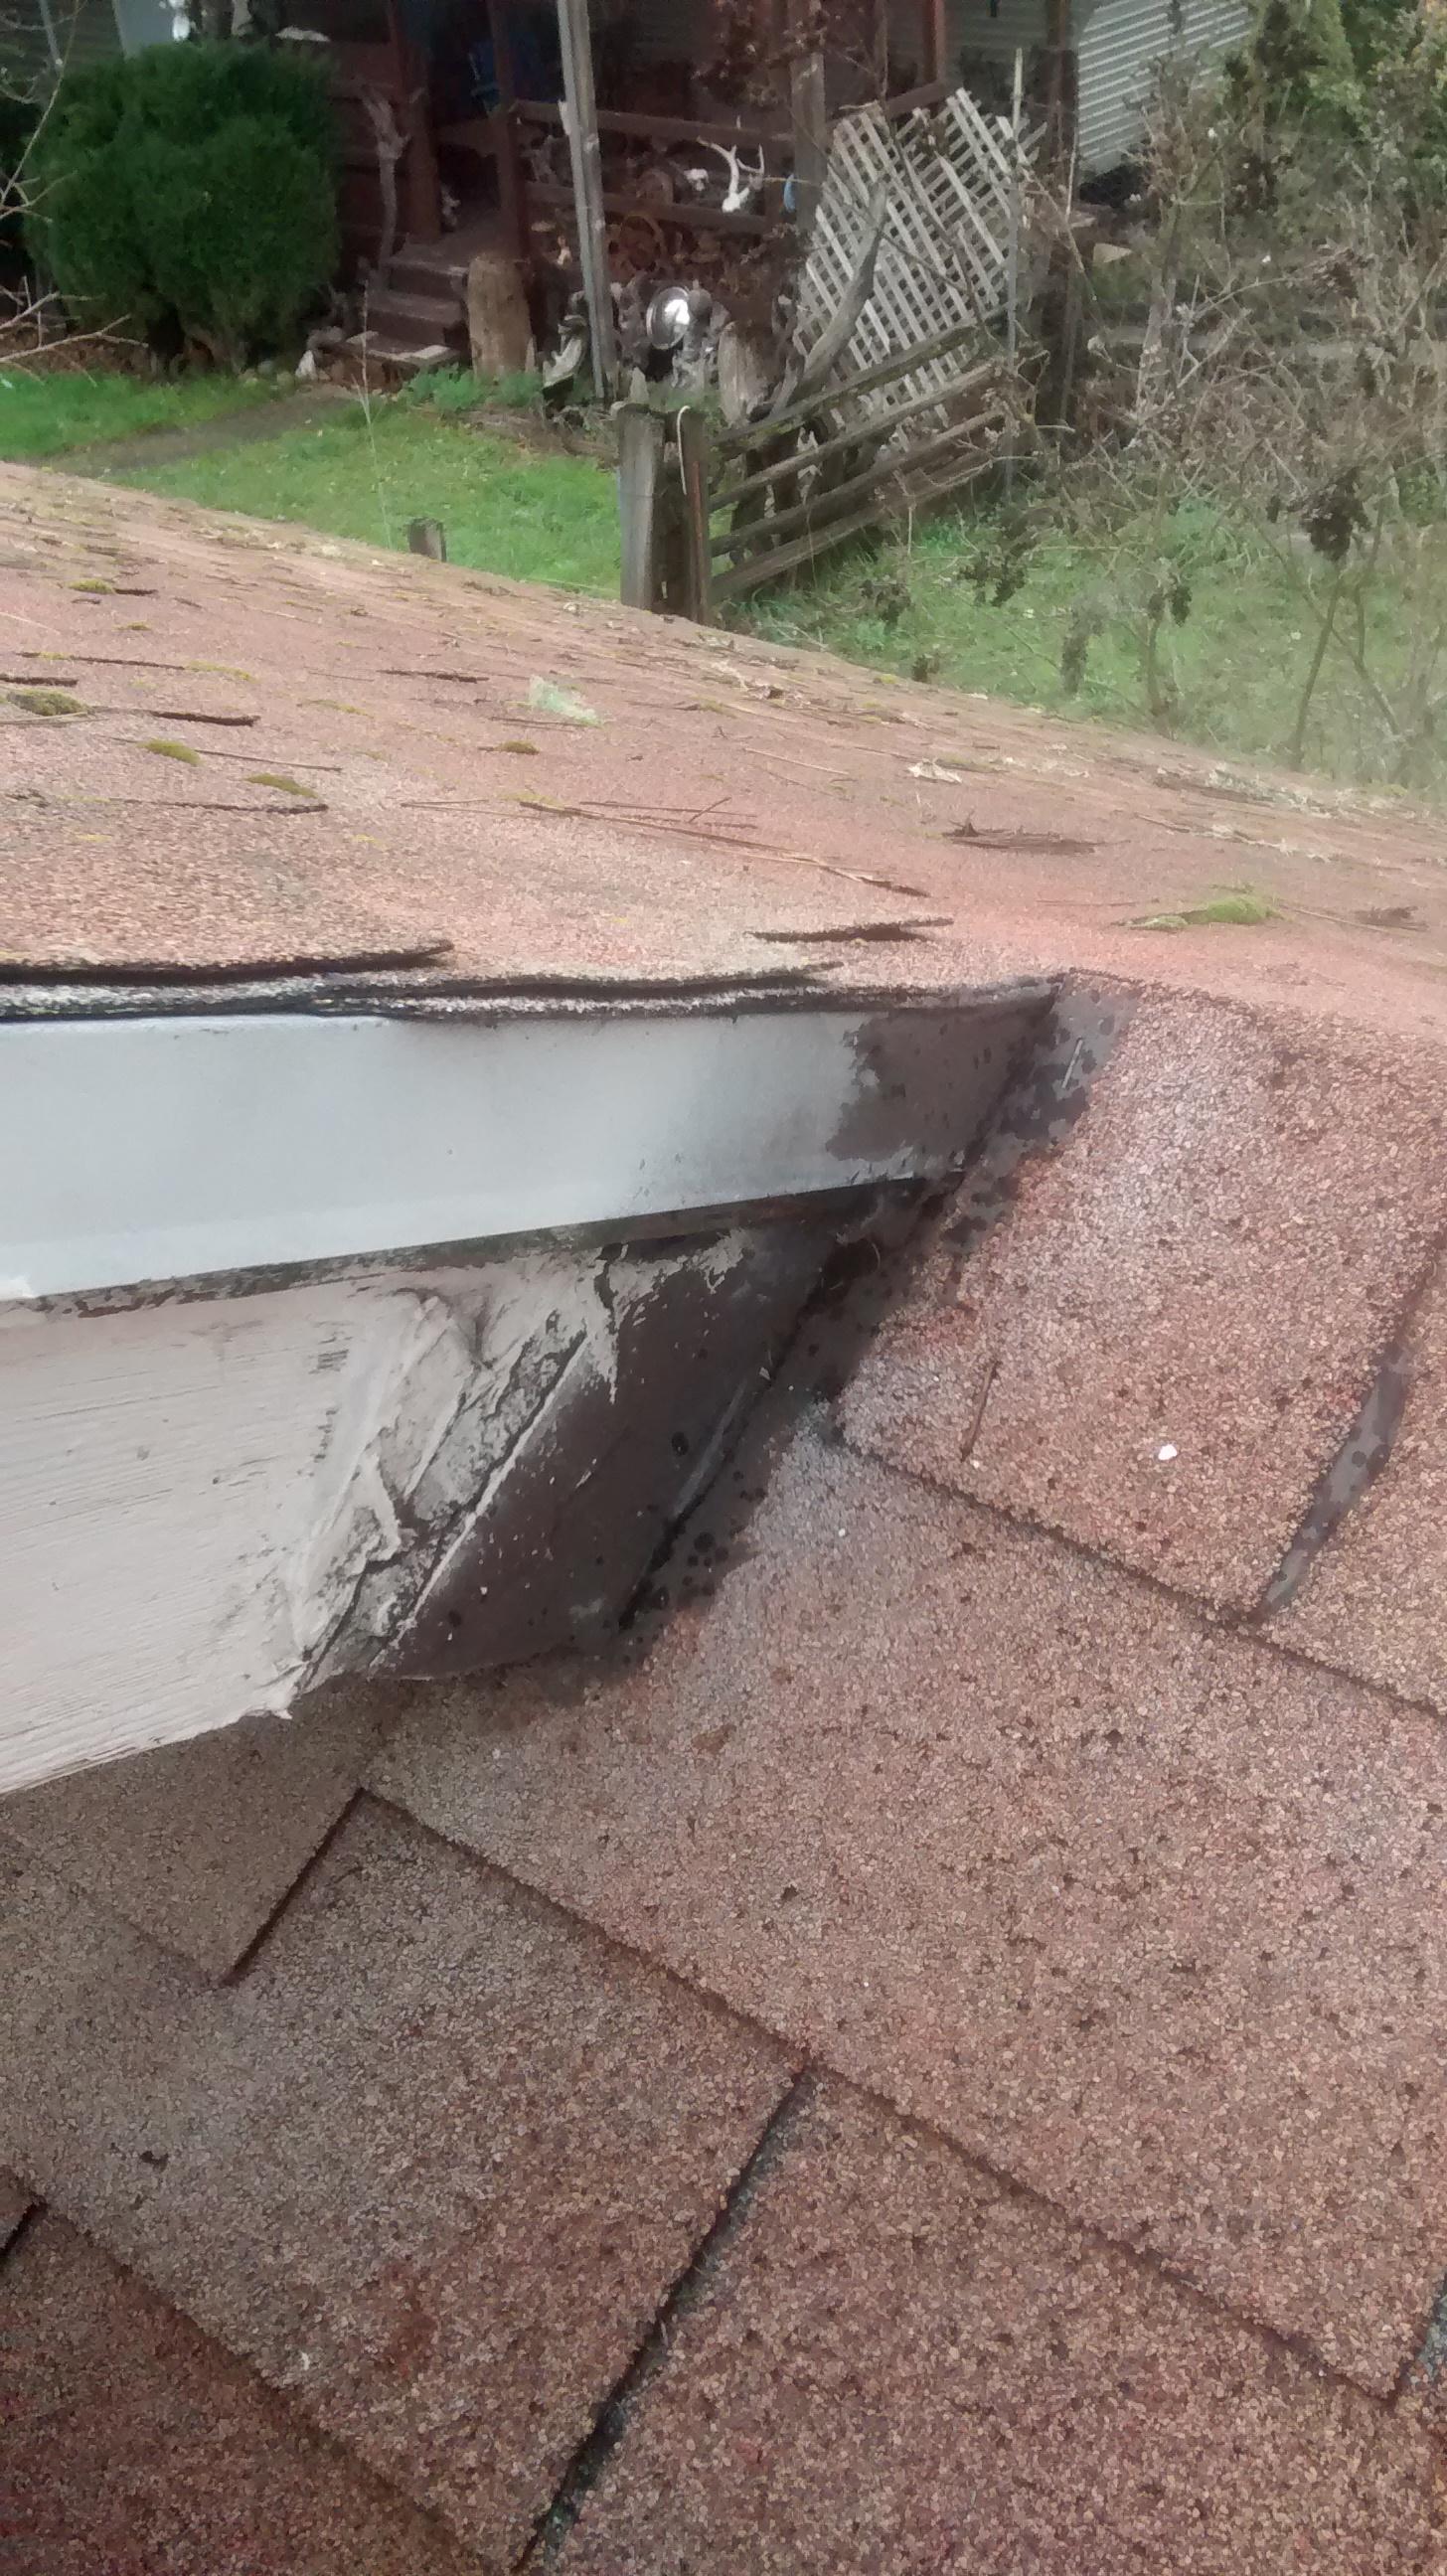 patching leaking roof-img_20190211_121534136.jpg